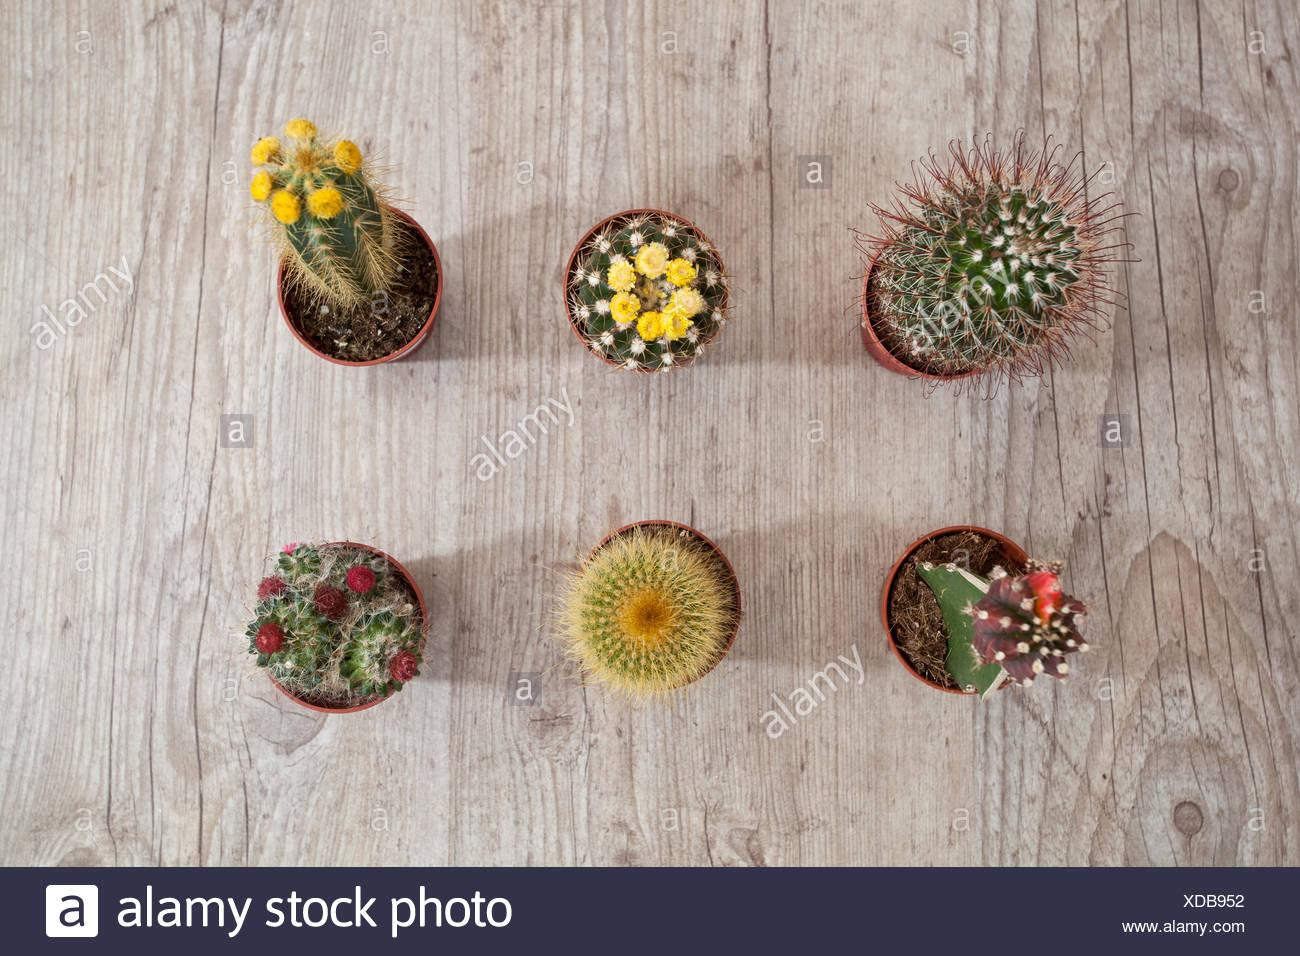 botany, decoration, cactus, maddening, pert, coquettish, cute, plant, garden, - Stock Image